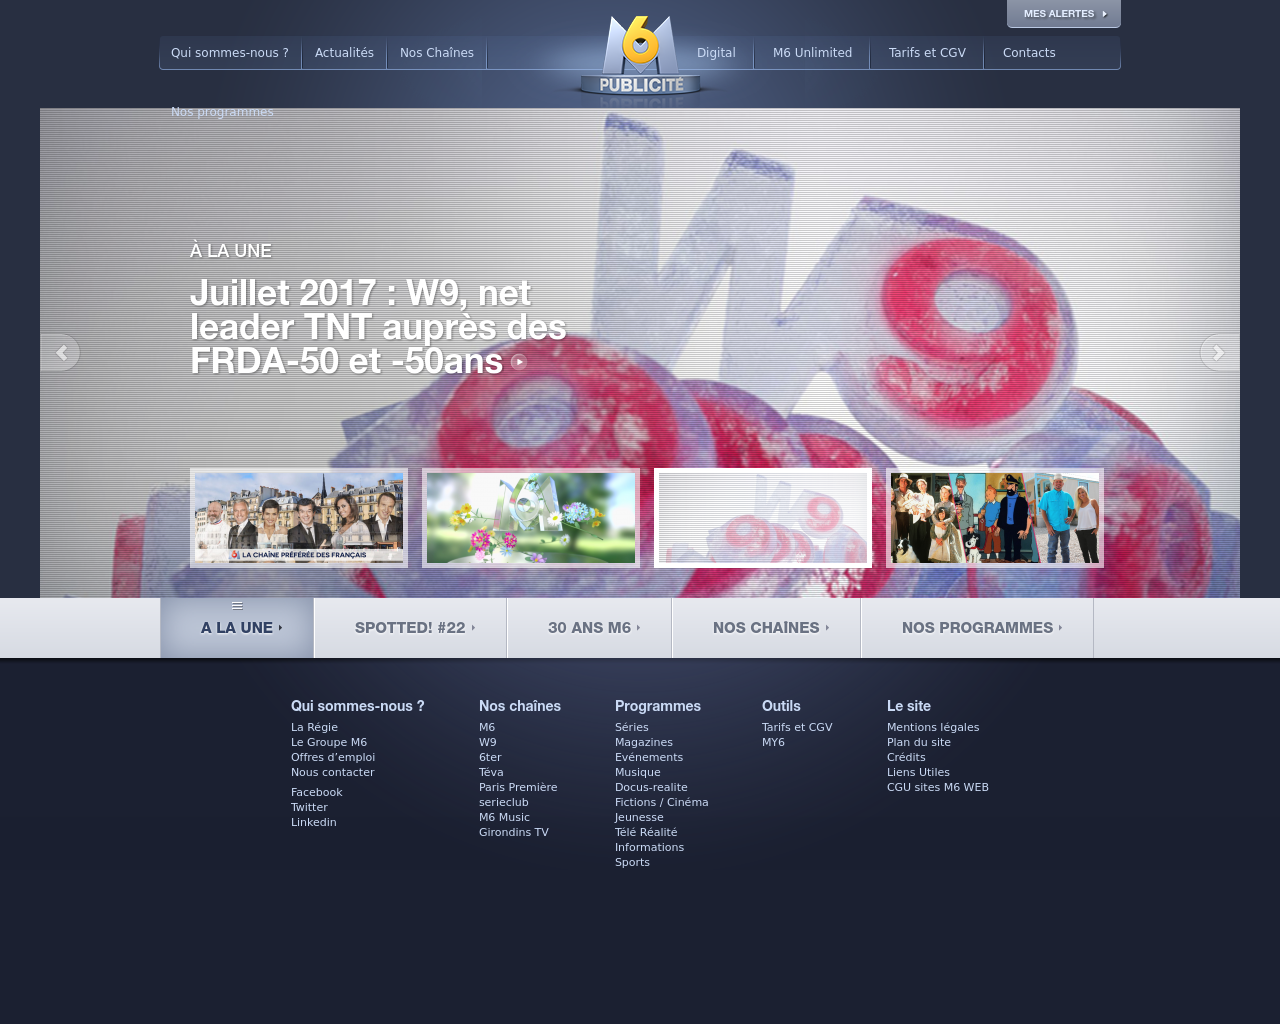 M6.fr-Advertising-Reviews-Pricing